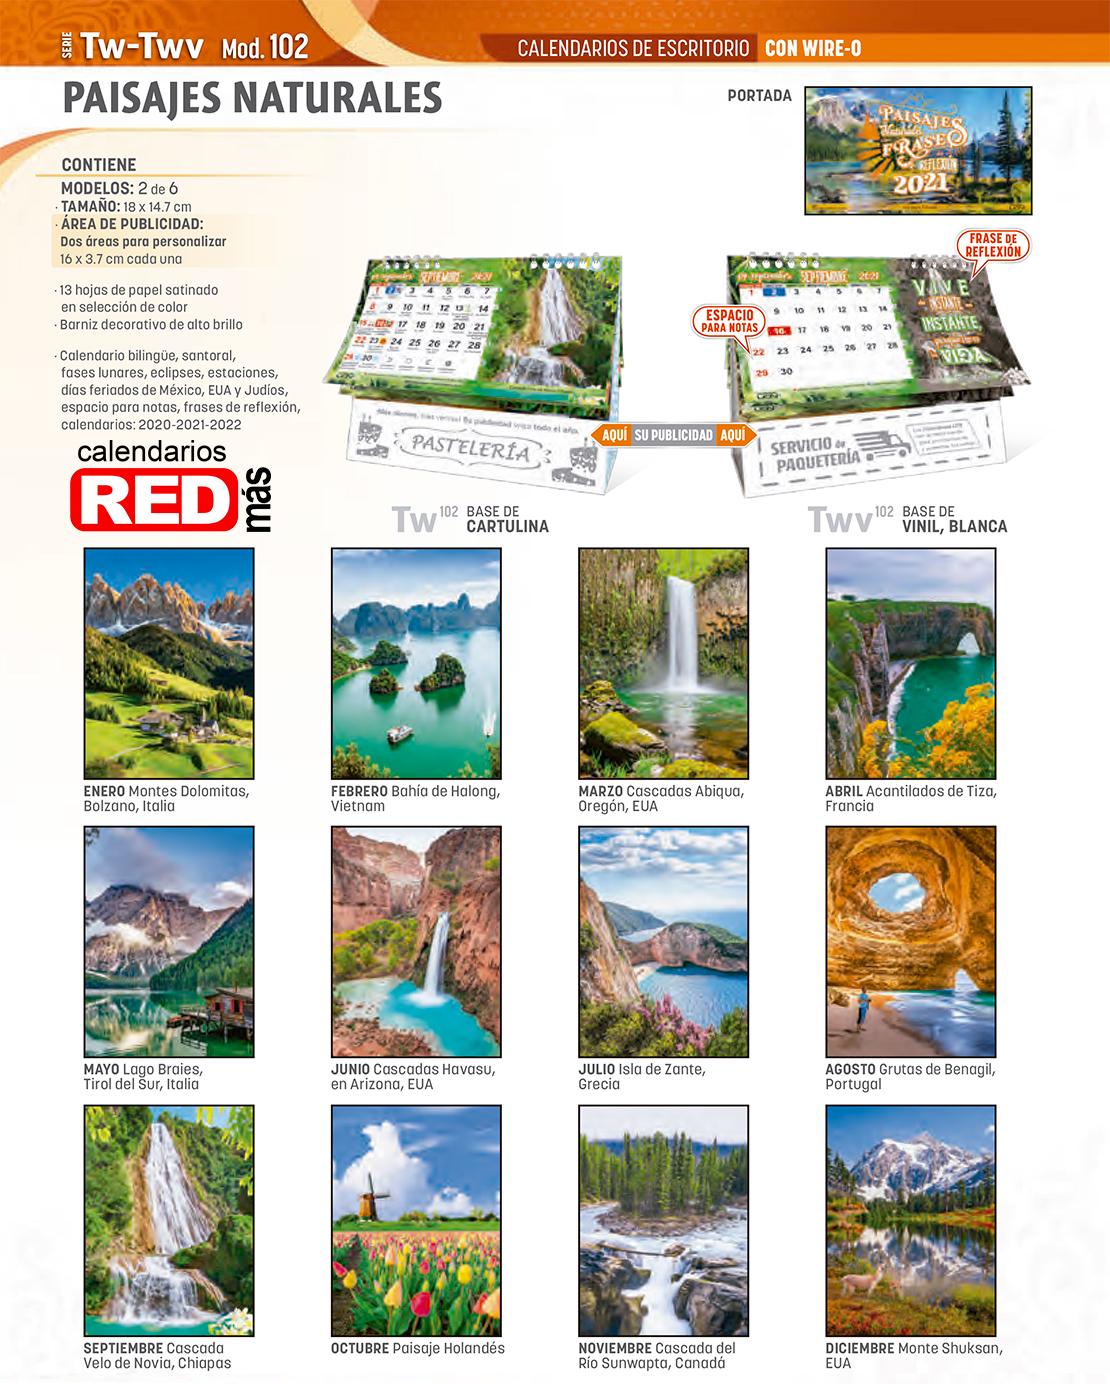 06-Catalogo-Calendarios-LEN-2021paisajes-naturales-mod-102.jpg